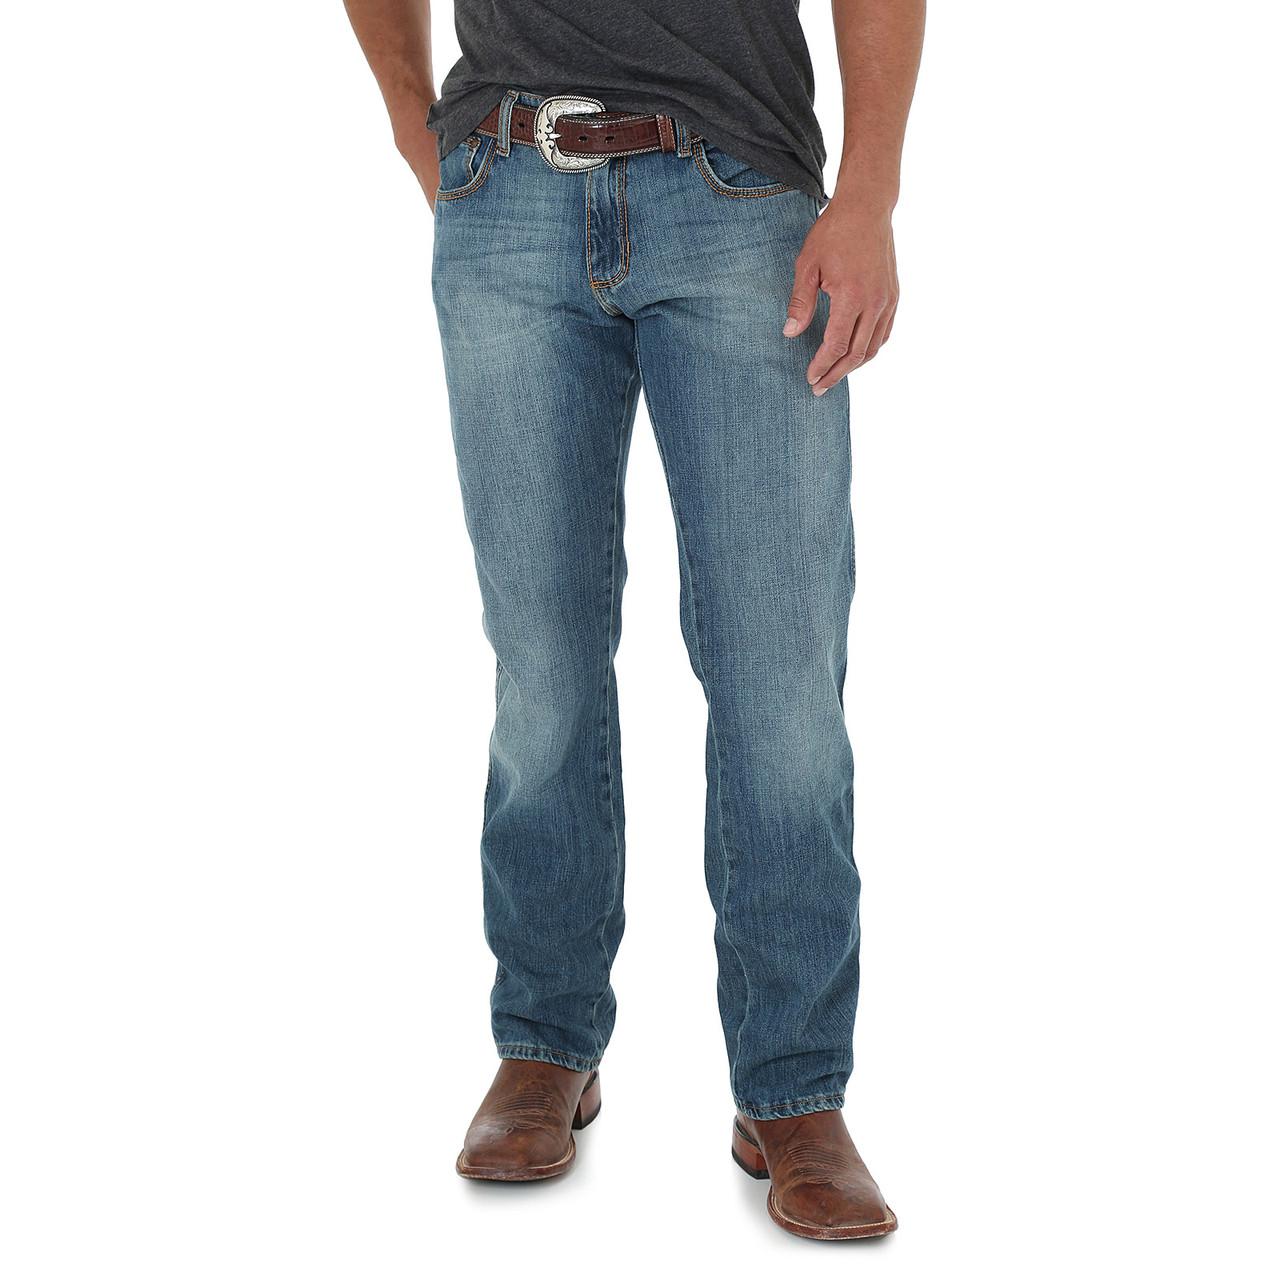 Джинсы Wrangler Retro Slim Fit Straight Leg, Rocky Top, 42W34L, 88MWZRT